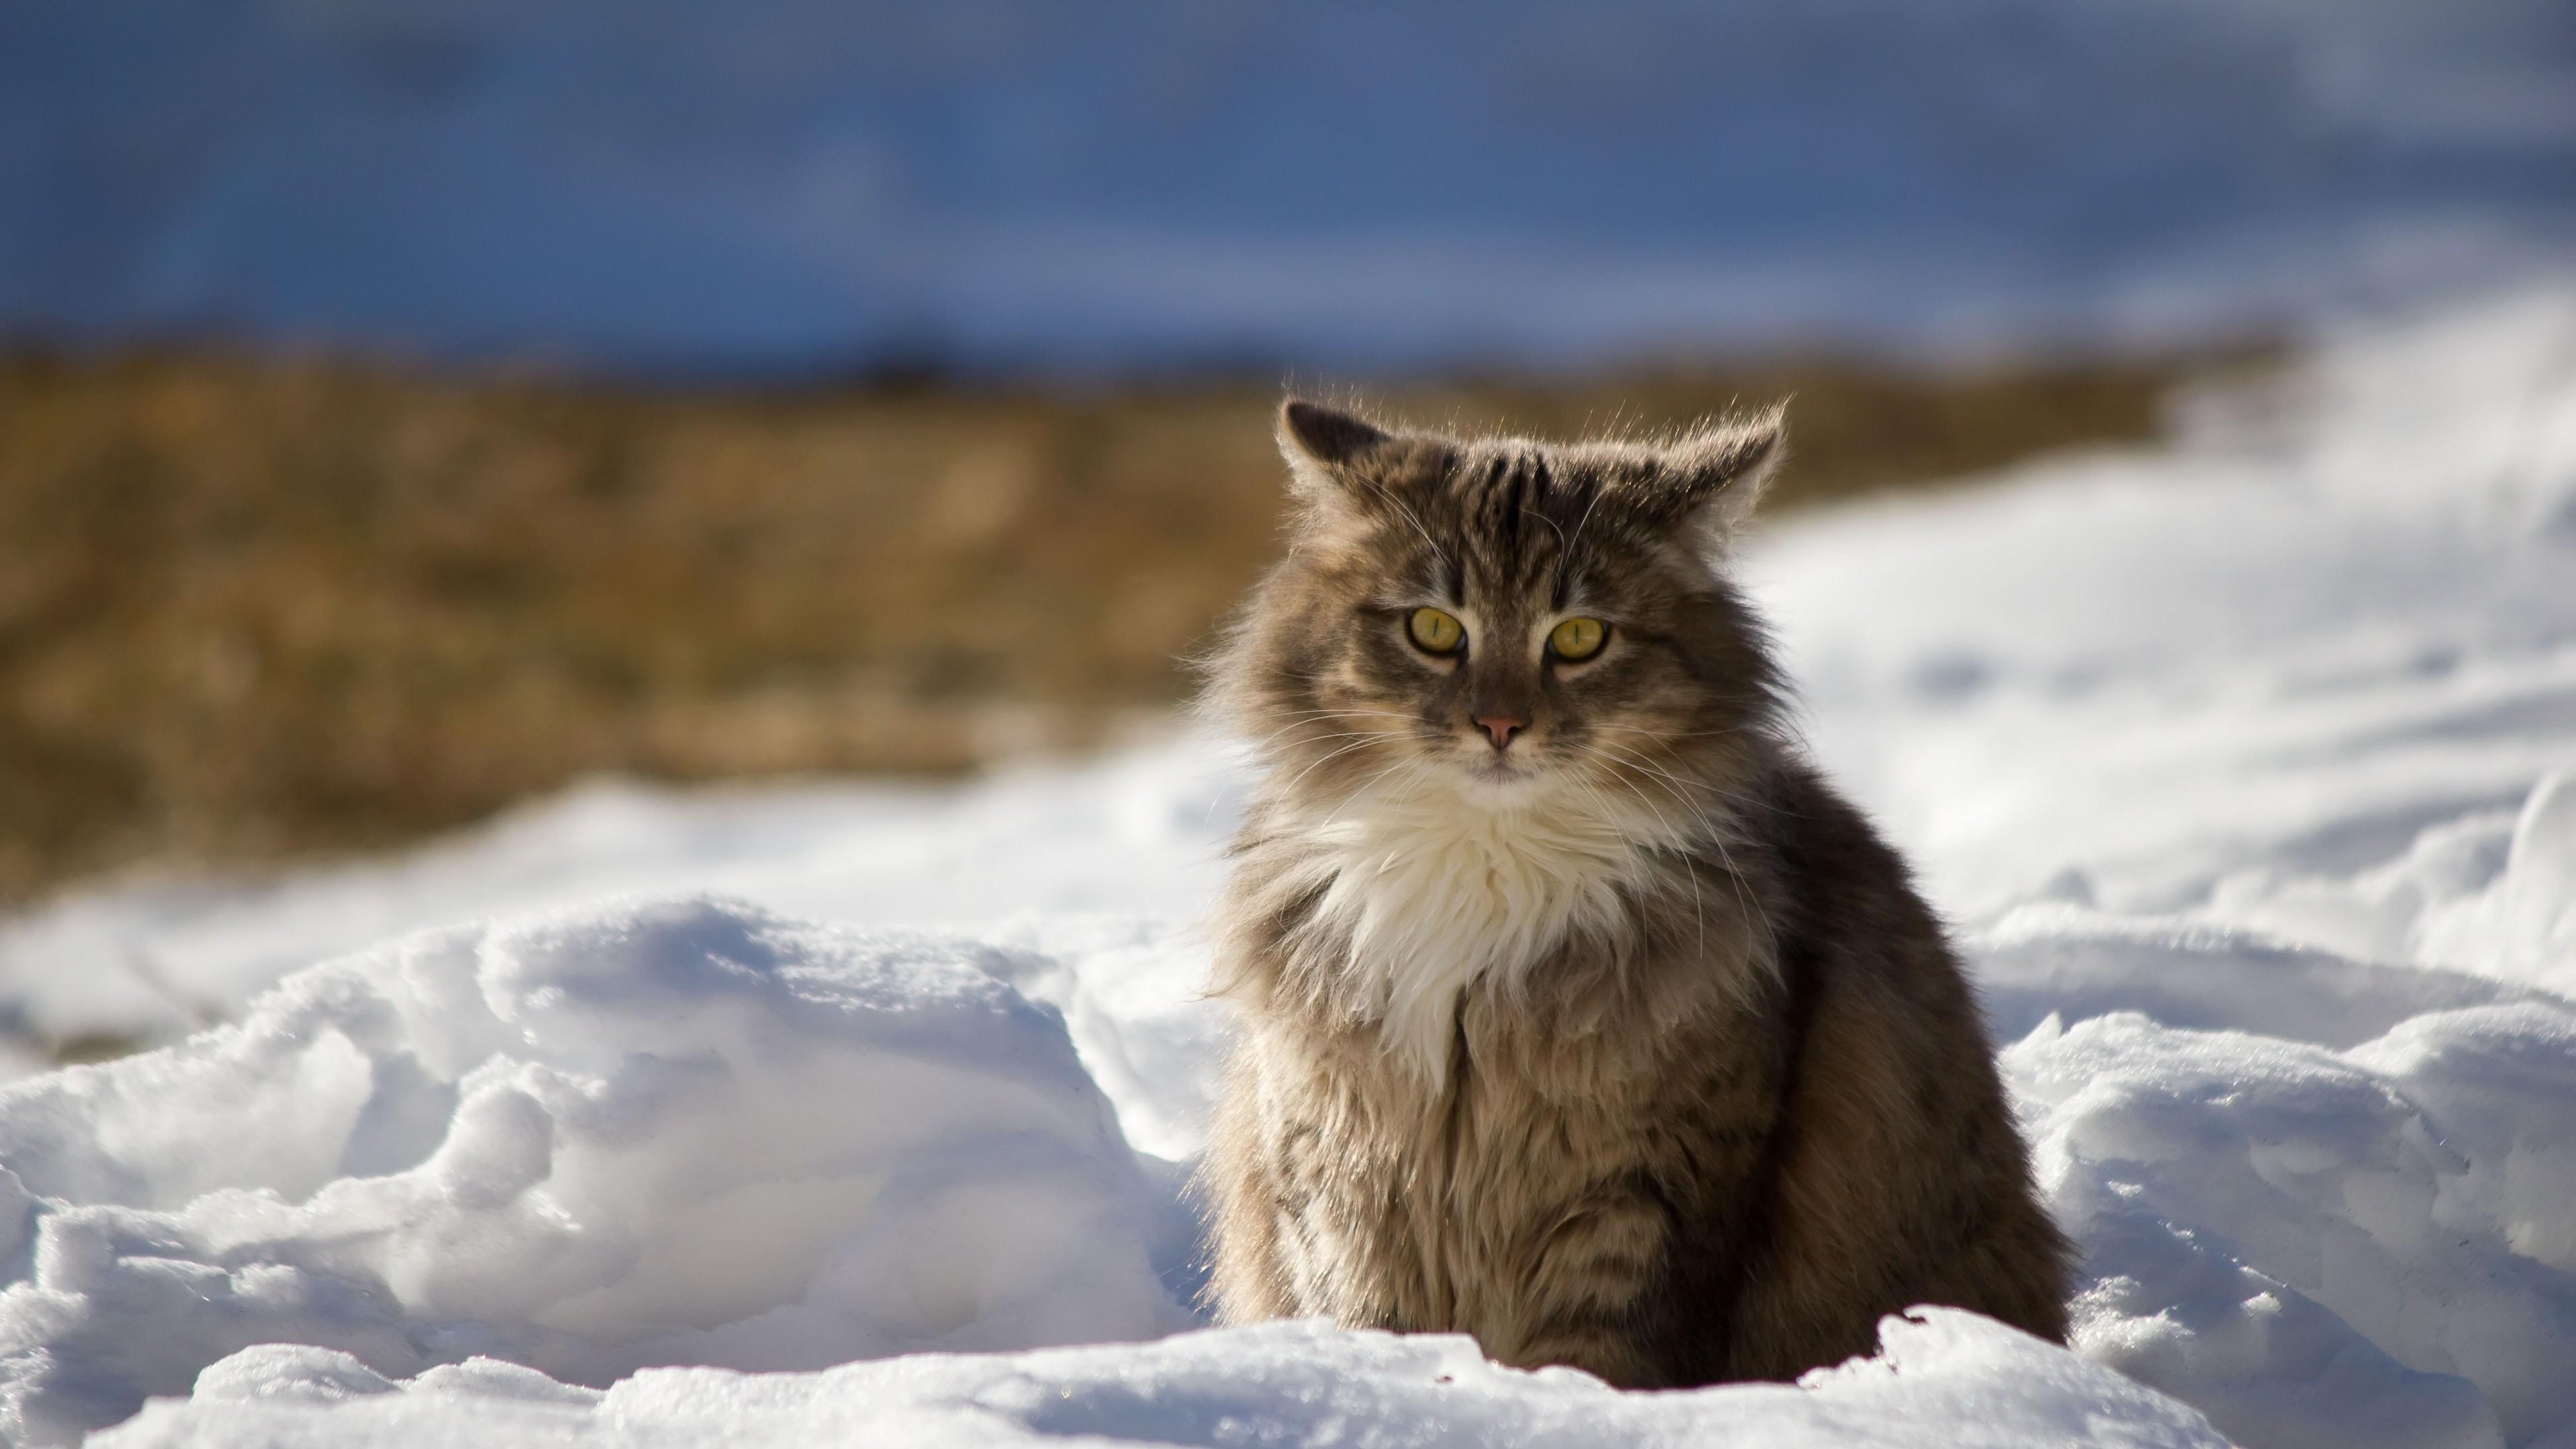 Preview wallpaper cat, winter, fluffy, snow 3840×2160